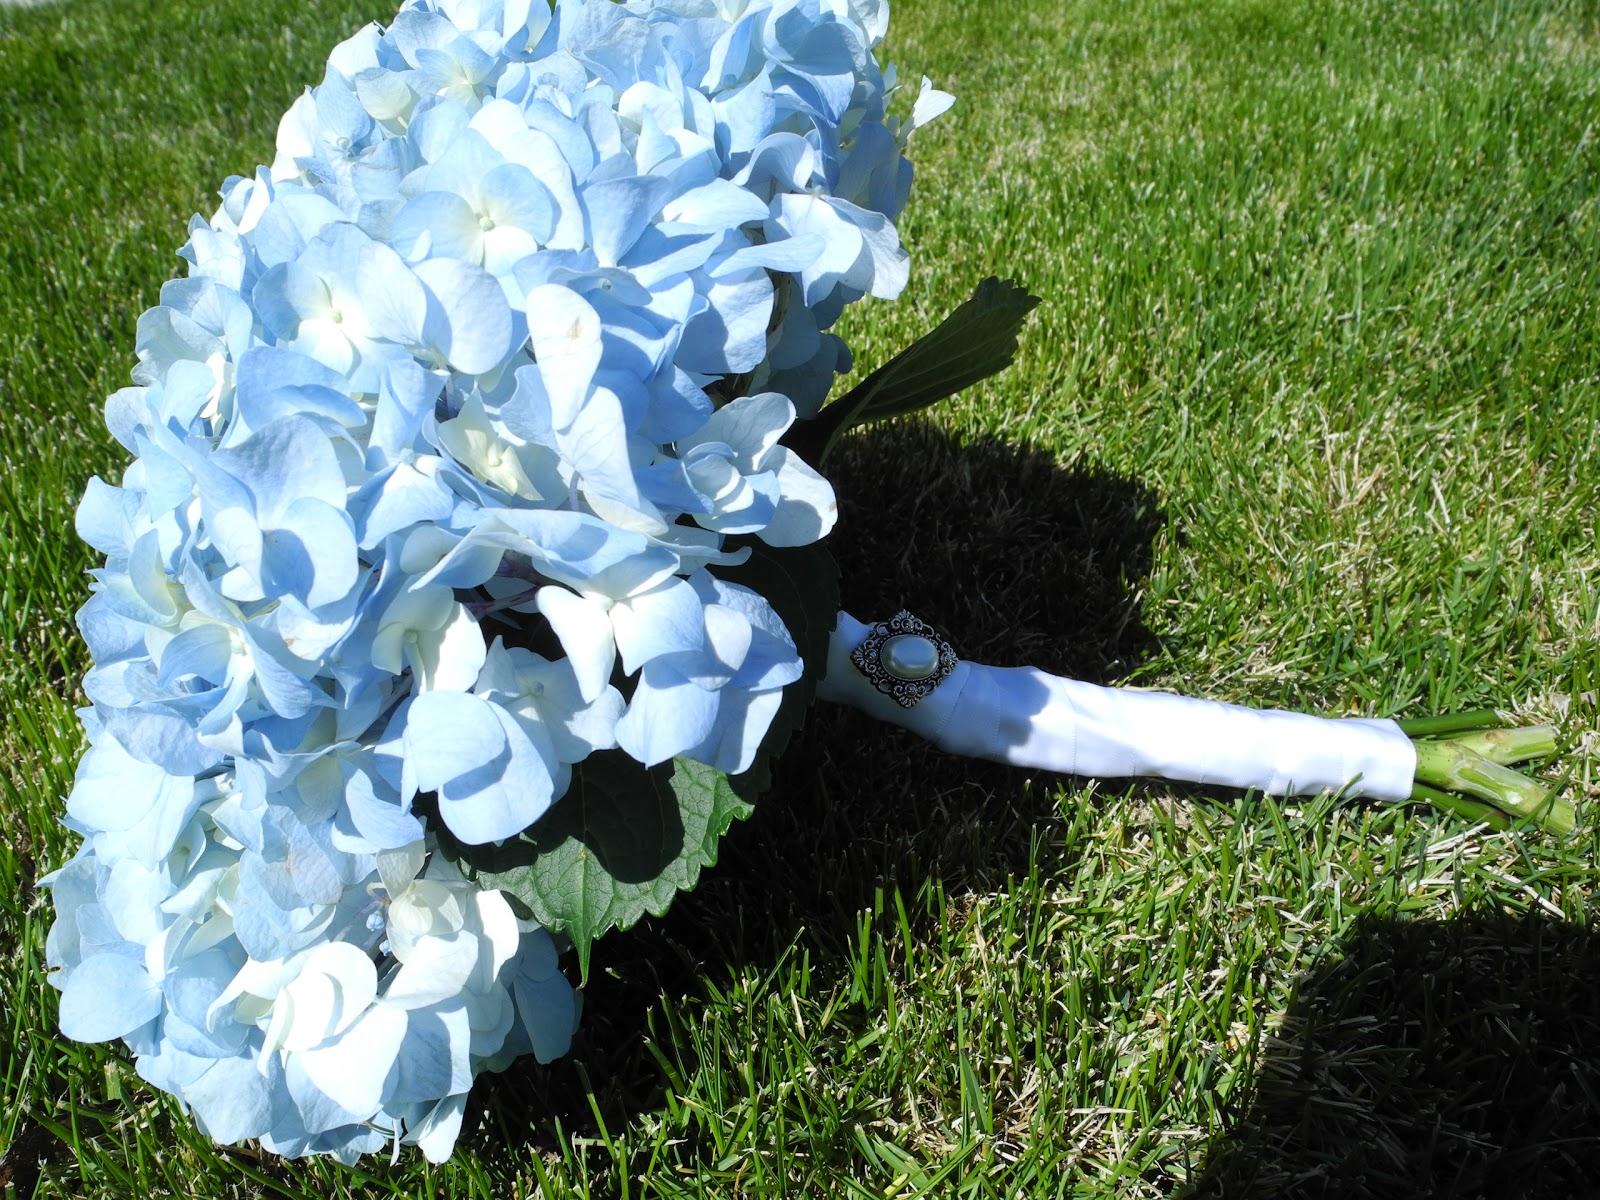 Stylish Wedding: Light Blue Hydrangea Bouquet |Light Blue Hydrangea Bouquet